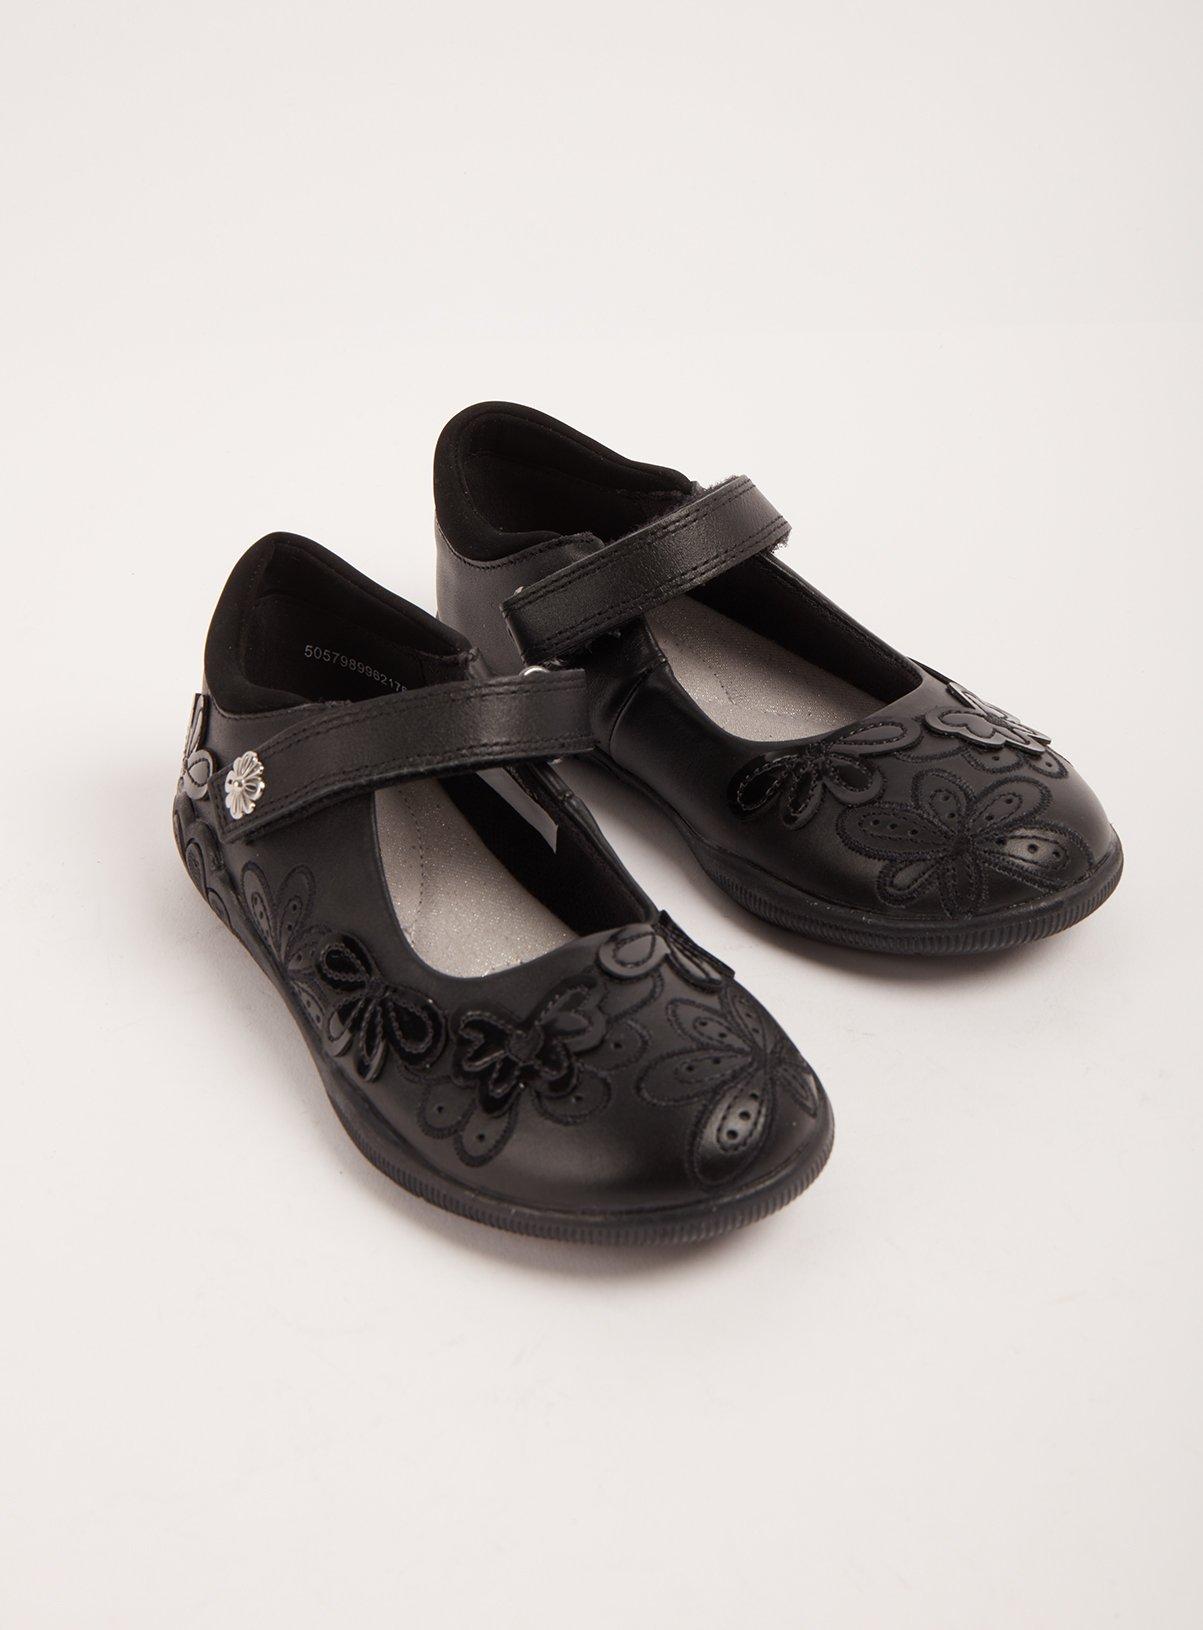 Black Floral Leather School Shoes - Half Sizes - 1.5